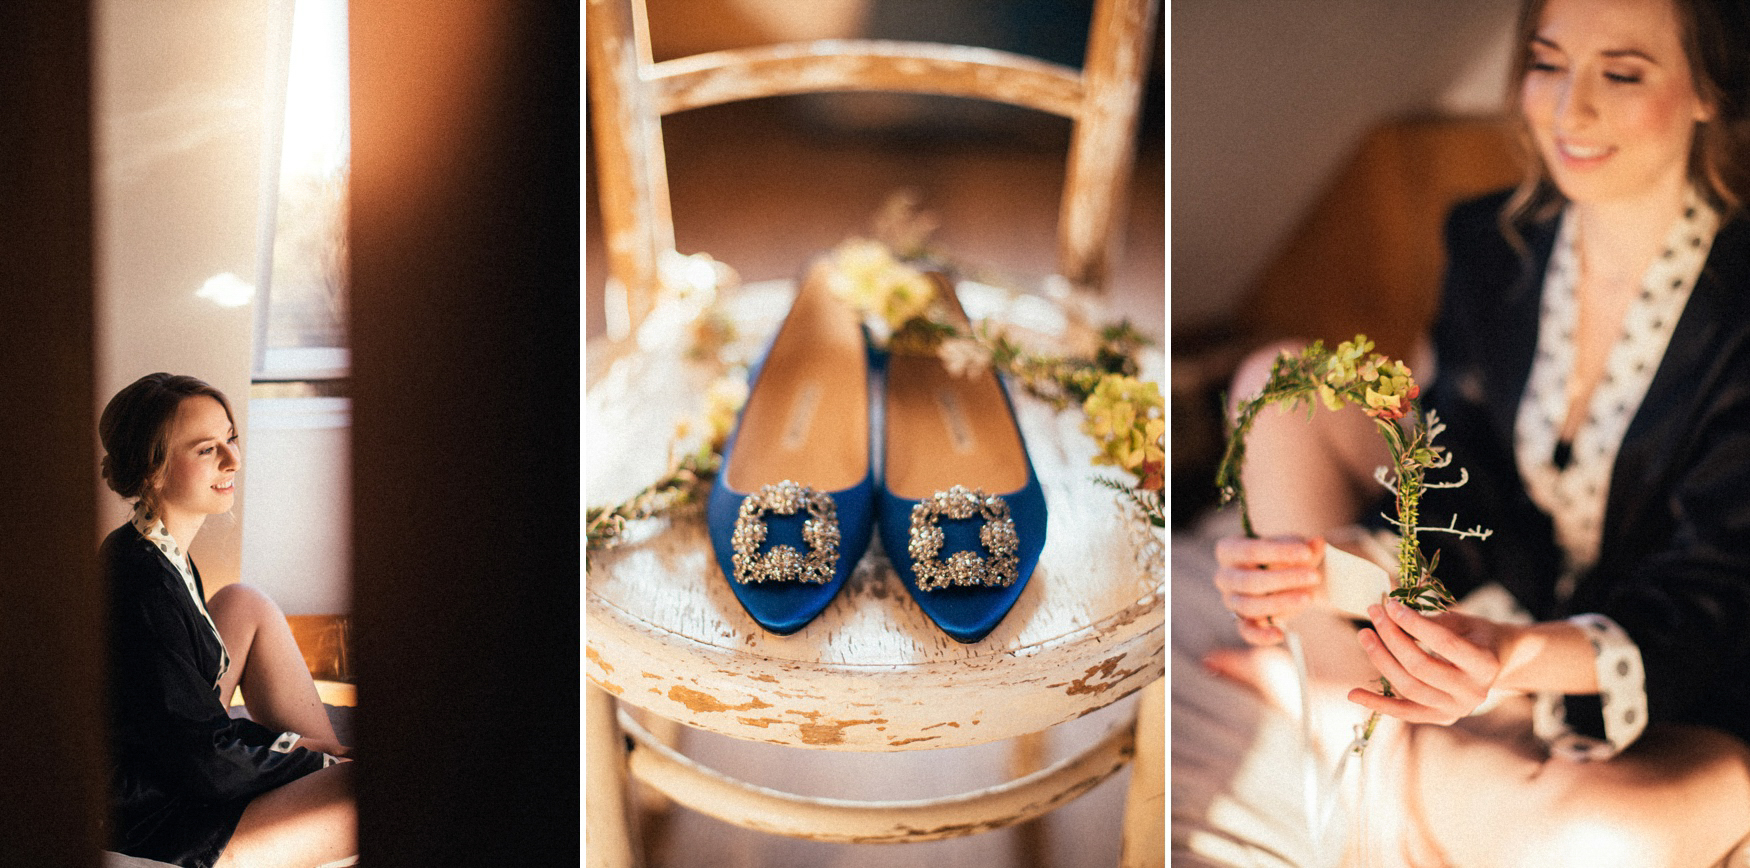 1 czech rustic wedding - svatba zikmundov024.jpg